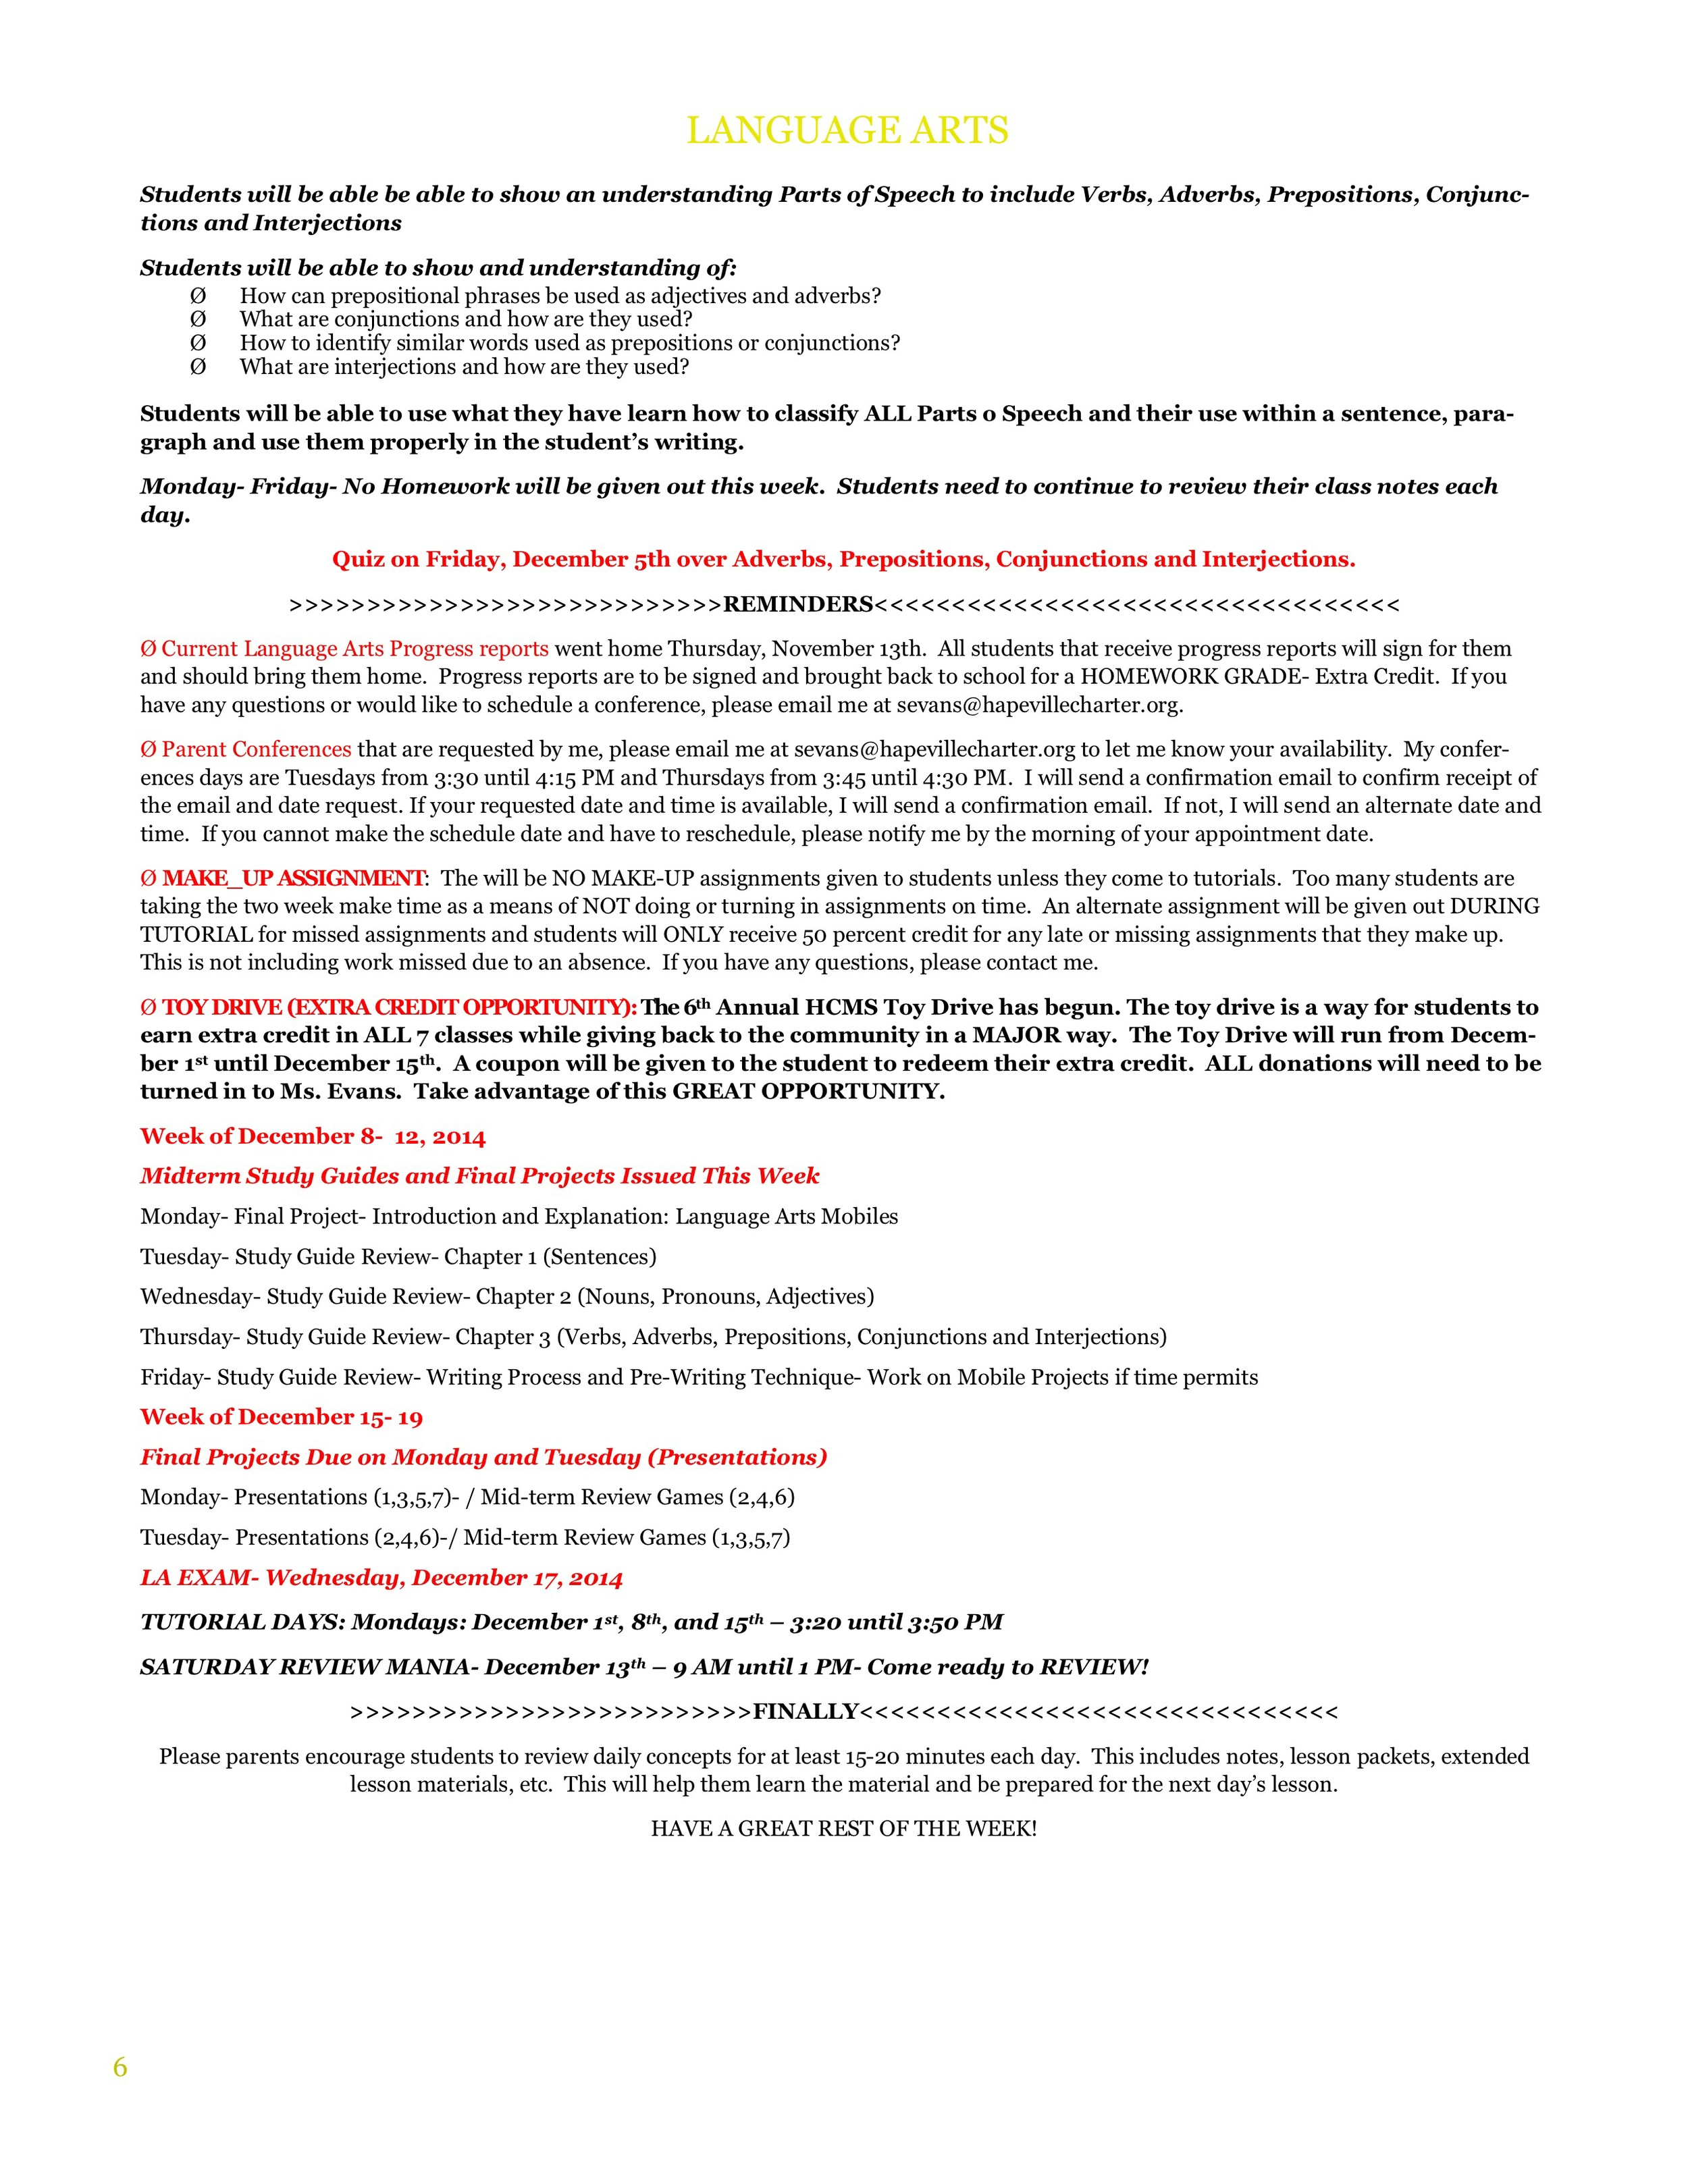 Newsletter Image6th grade December 8-12 6.jpeg